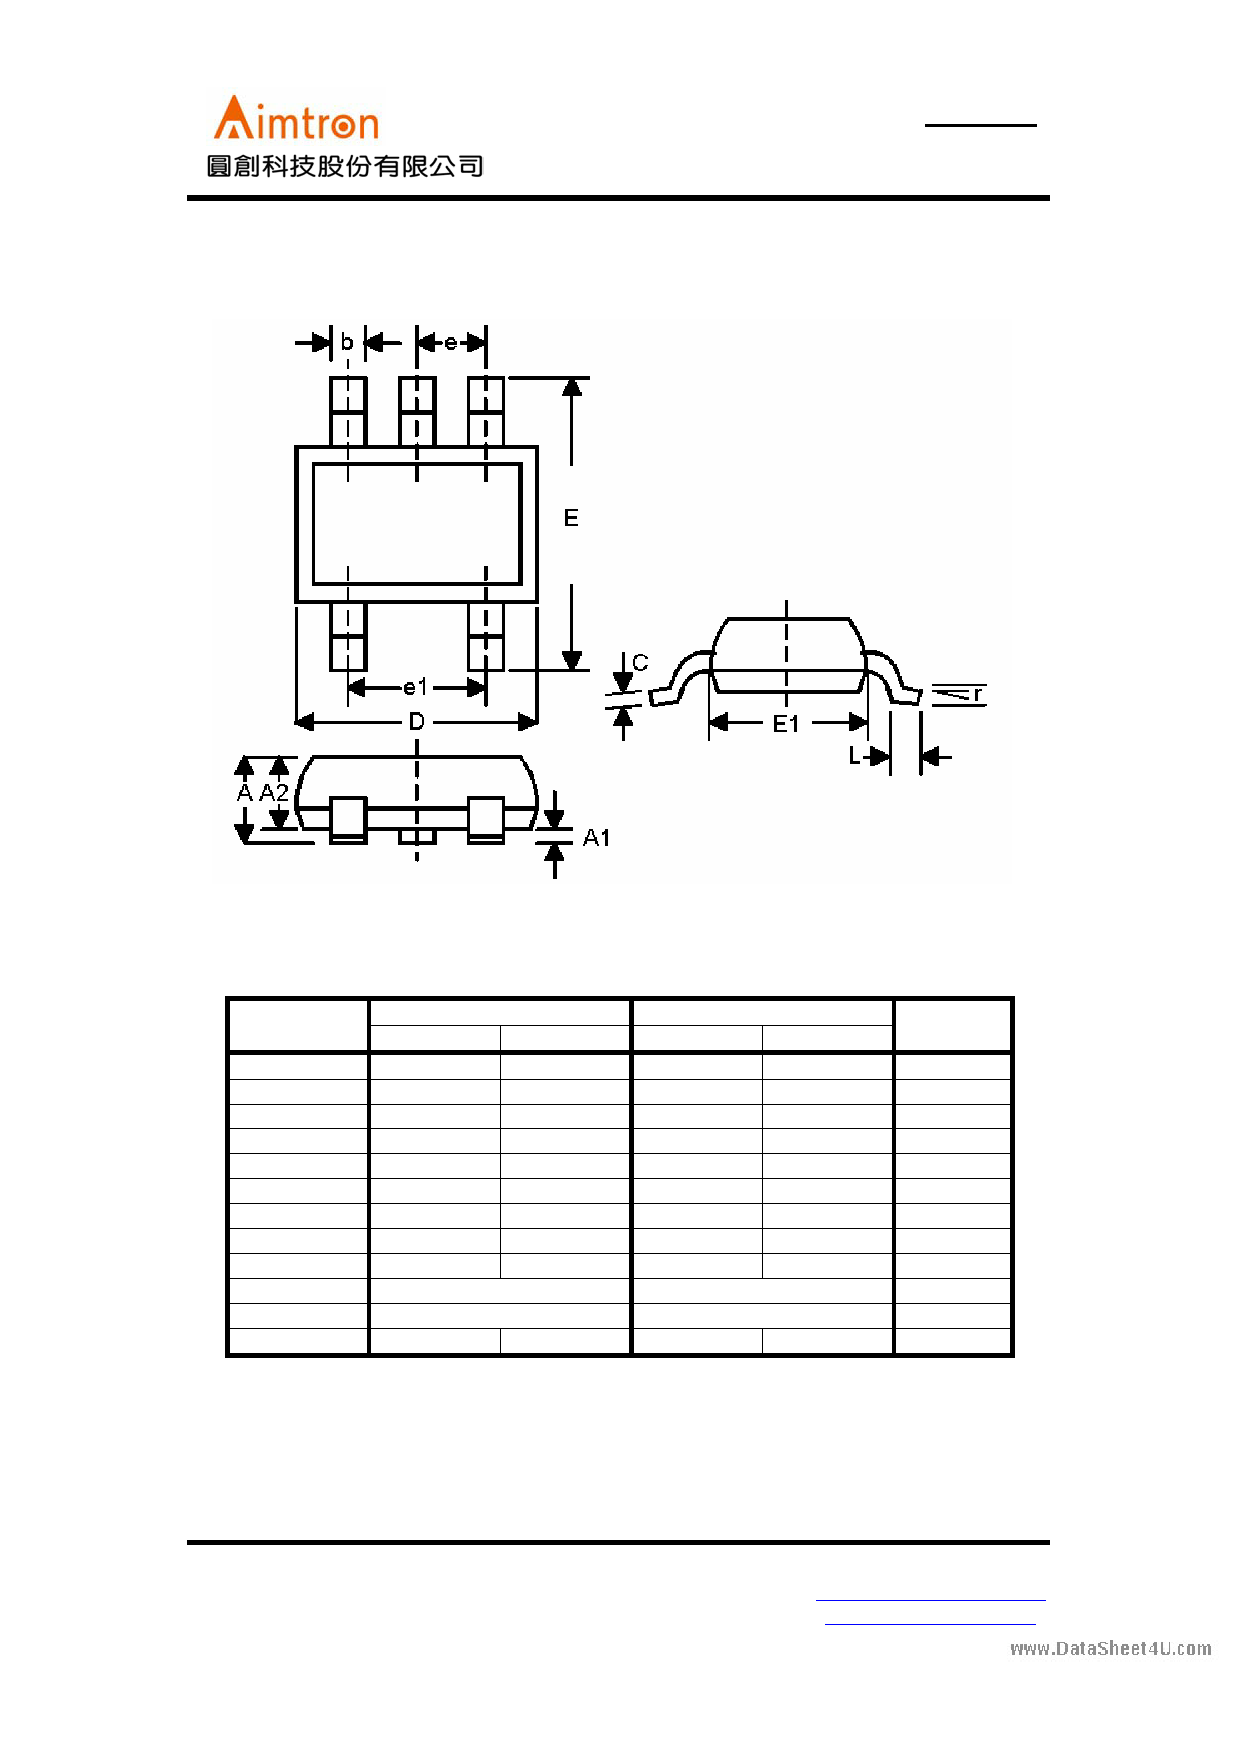 AT1201 電子部品, 半導体